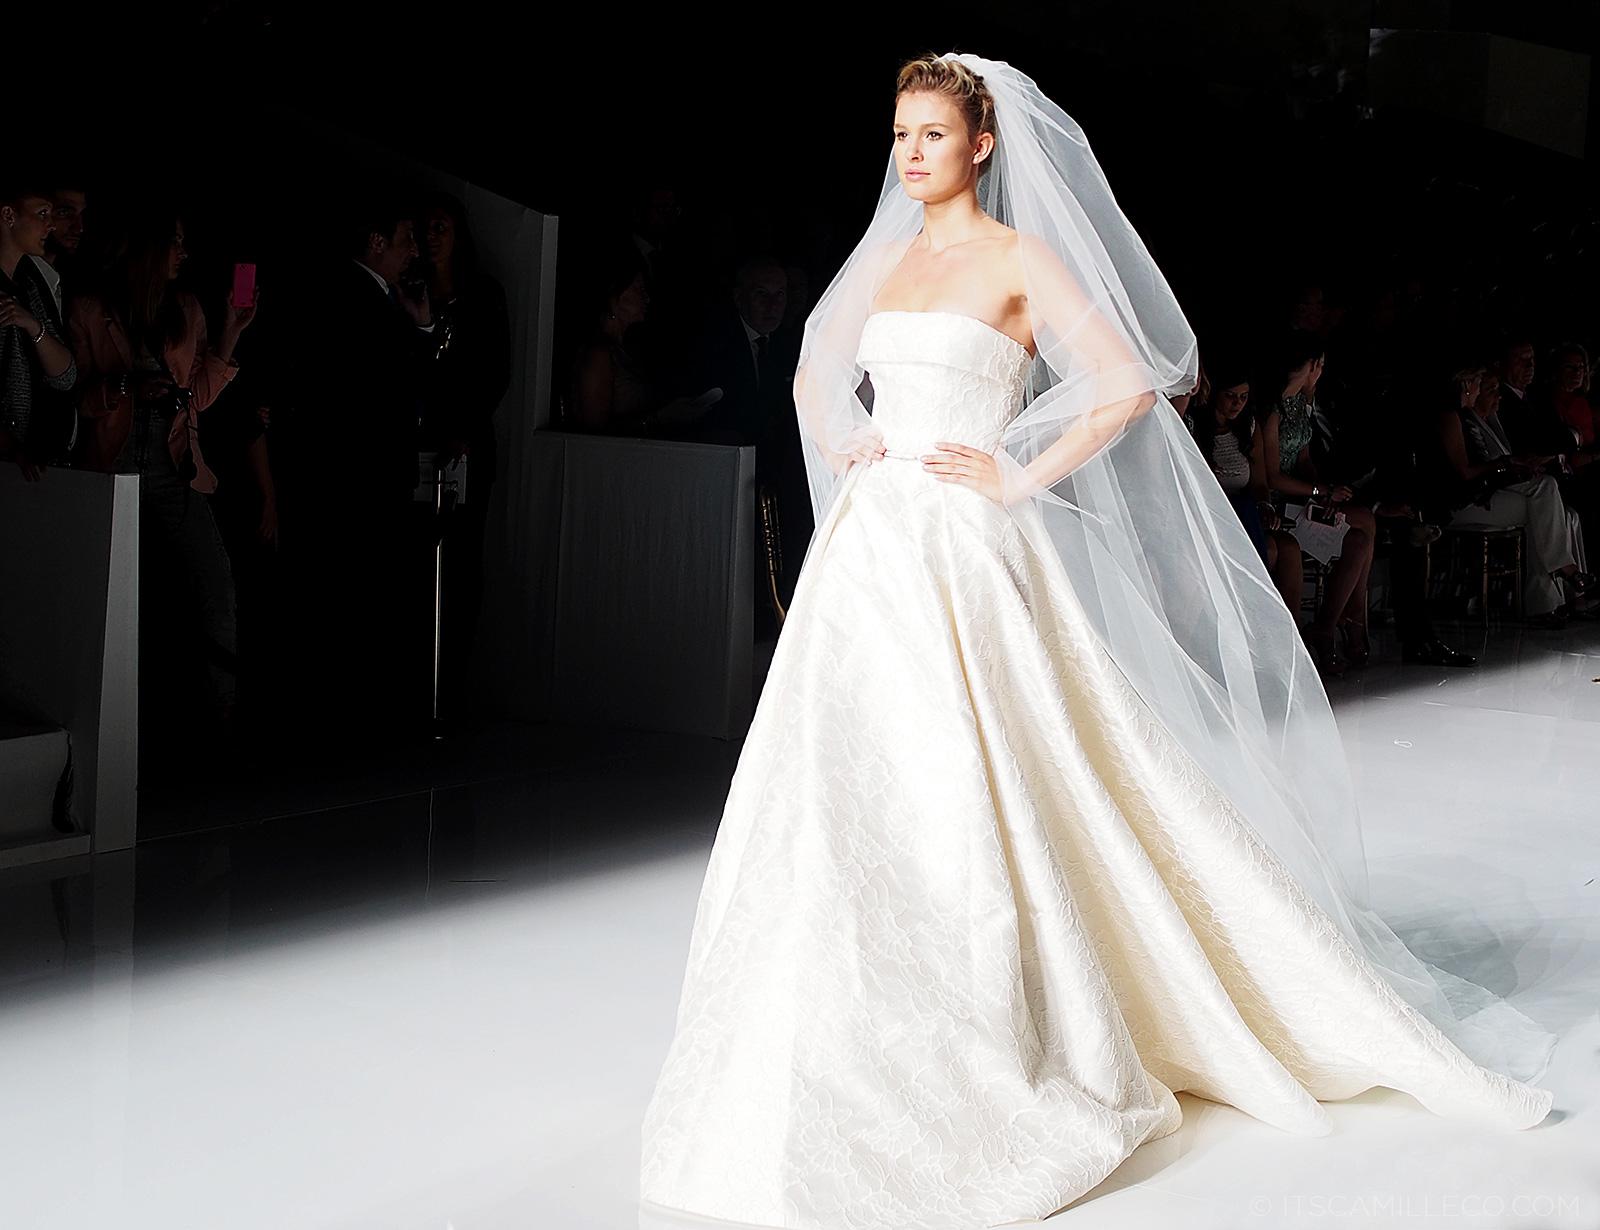 Simplest Wedding Dress 48 Amazing  itscamilleco